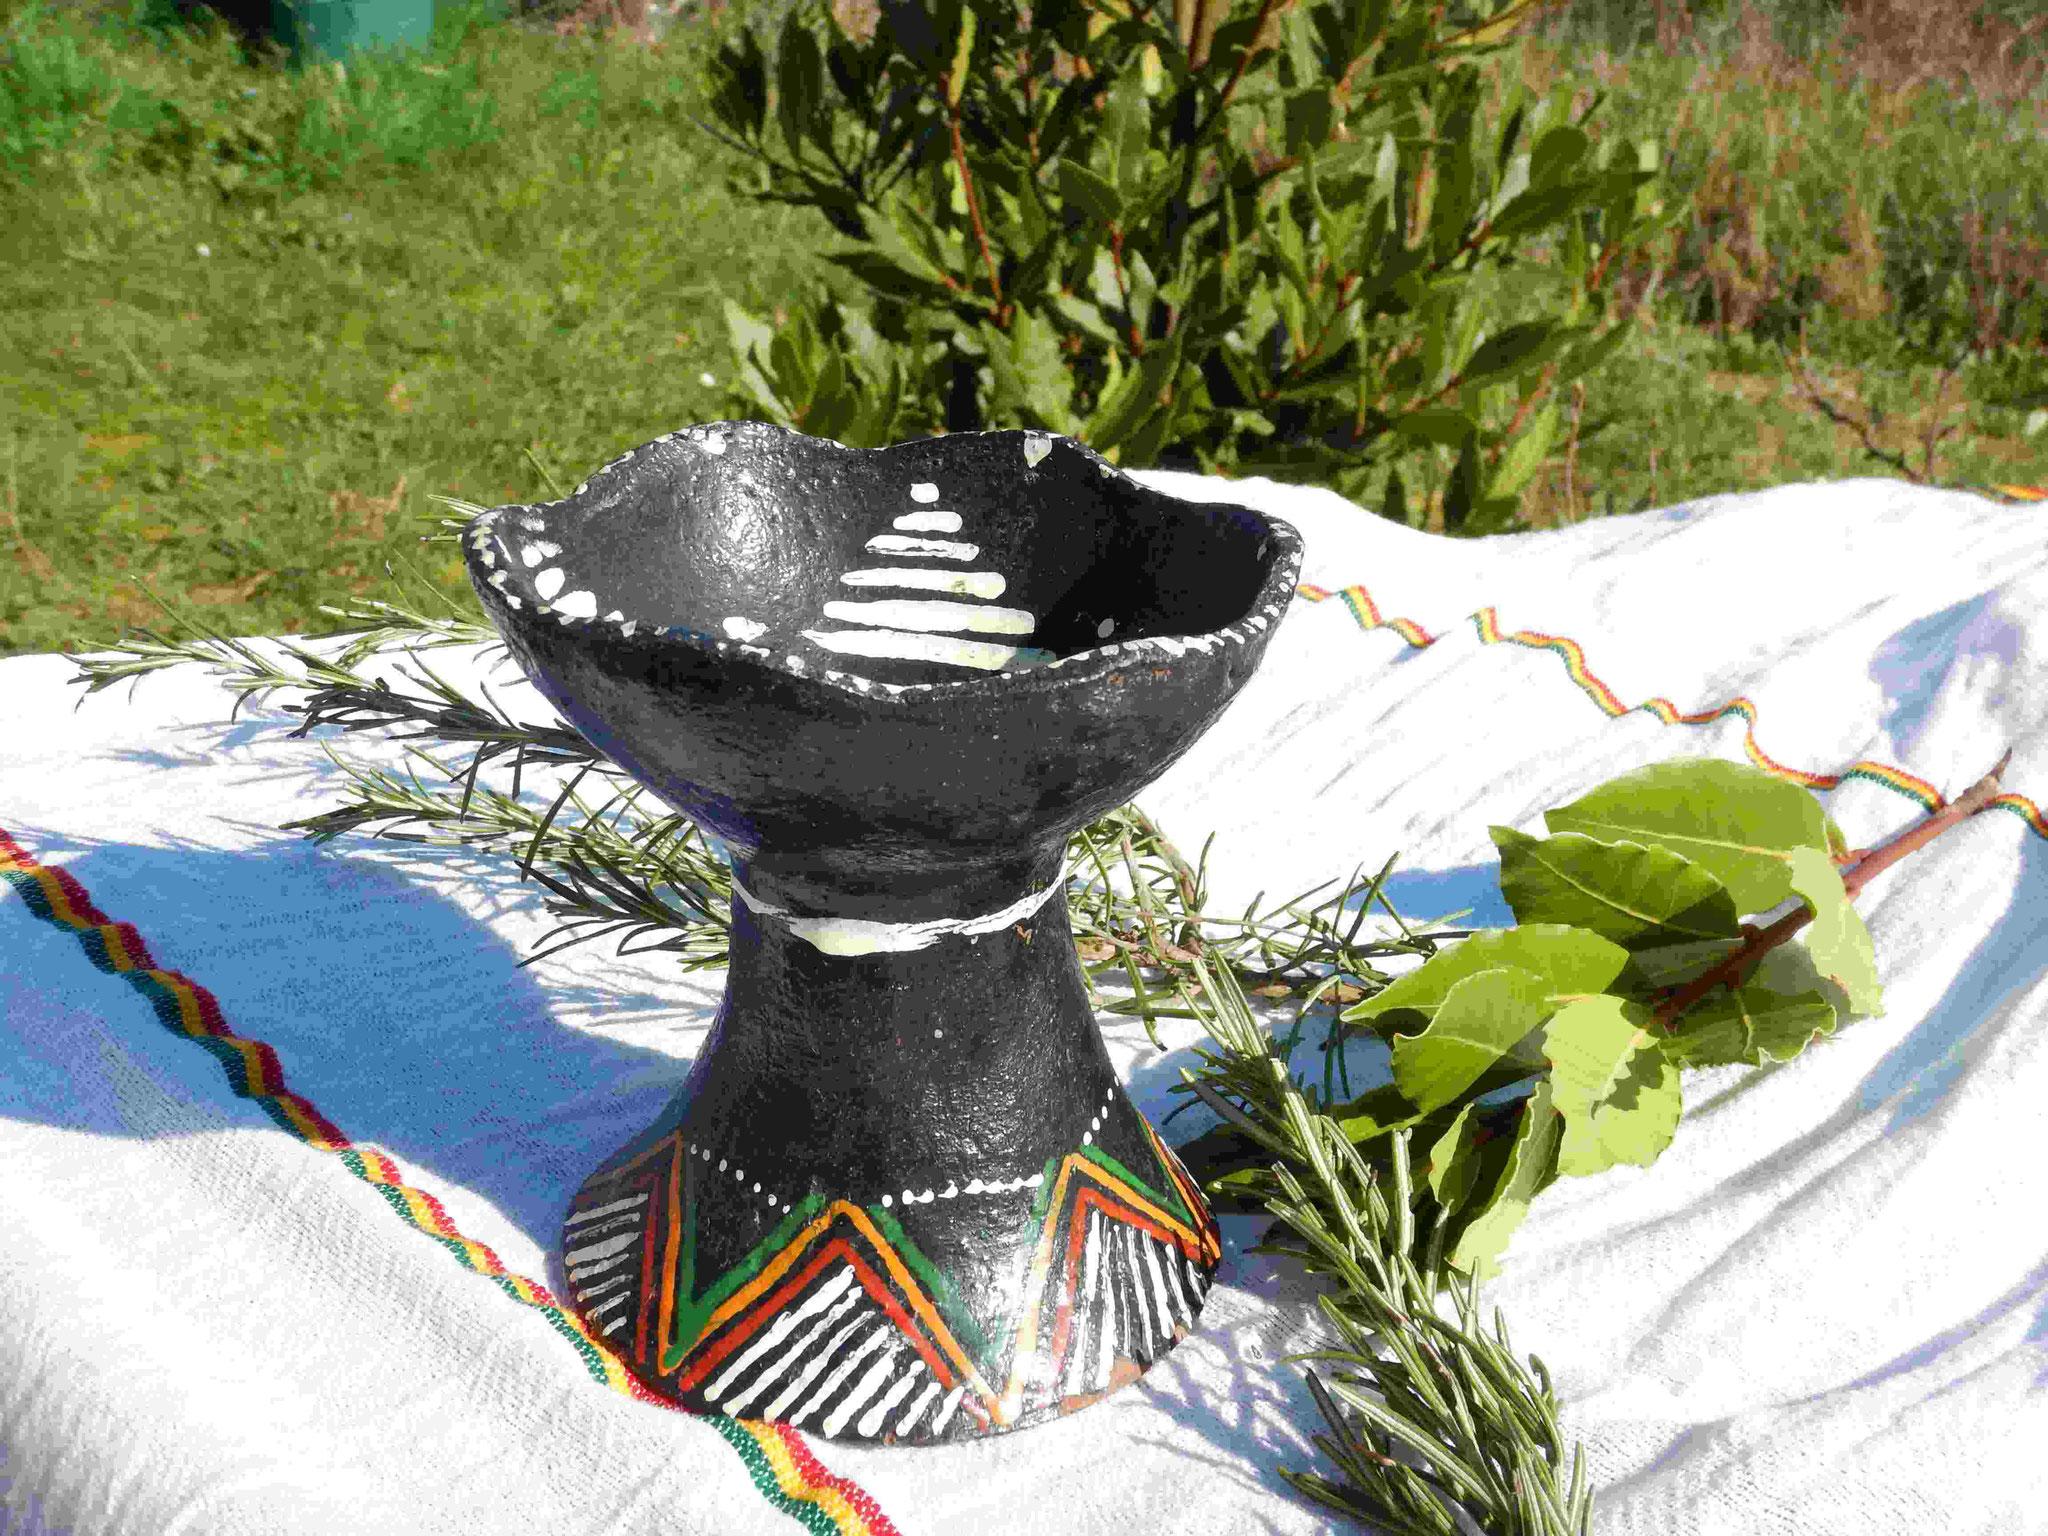 Pot encens Ethiopie Artisanat ethiopien Epices éthiopiennes made by locals solidaire équitable artisanat textils voyage Ethiopie 1